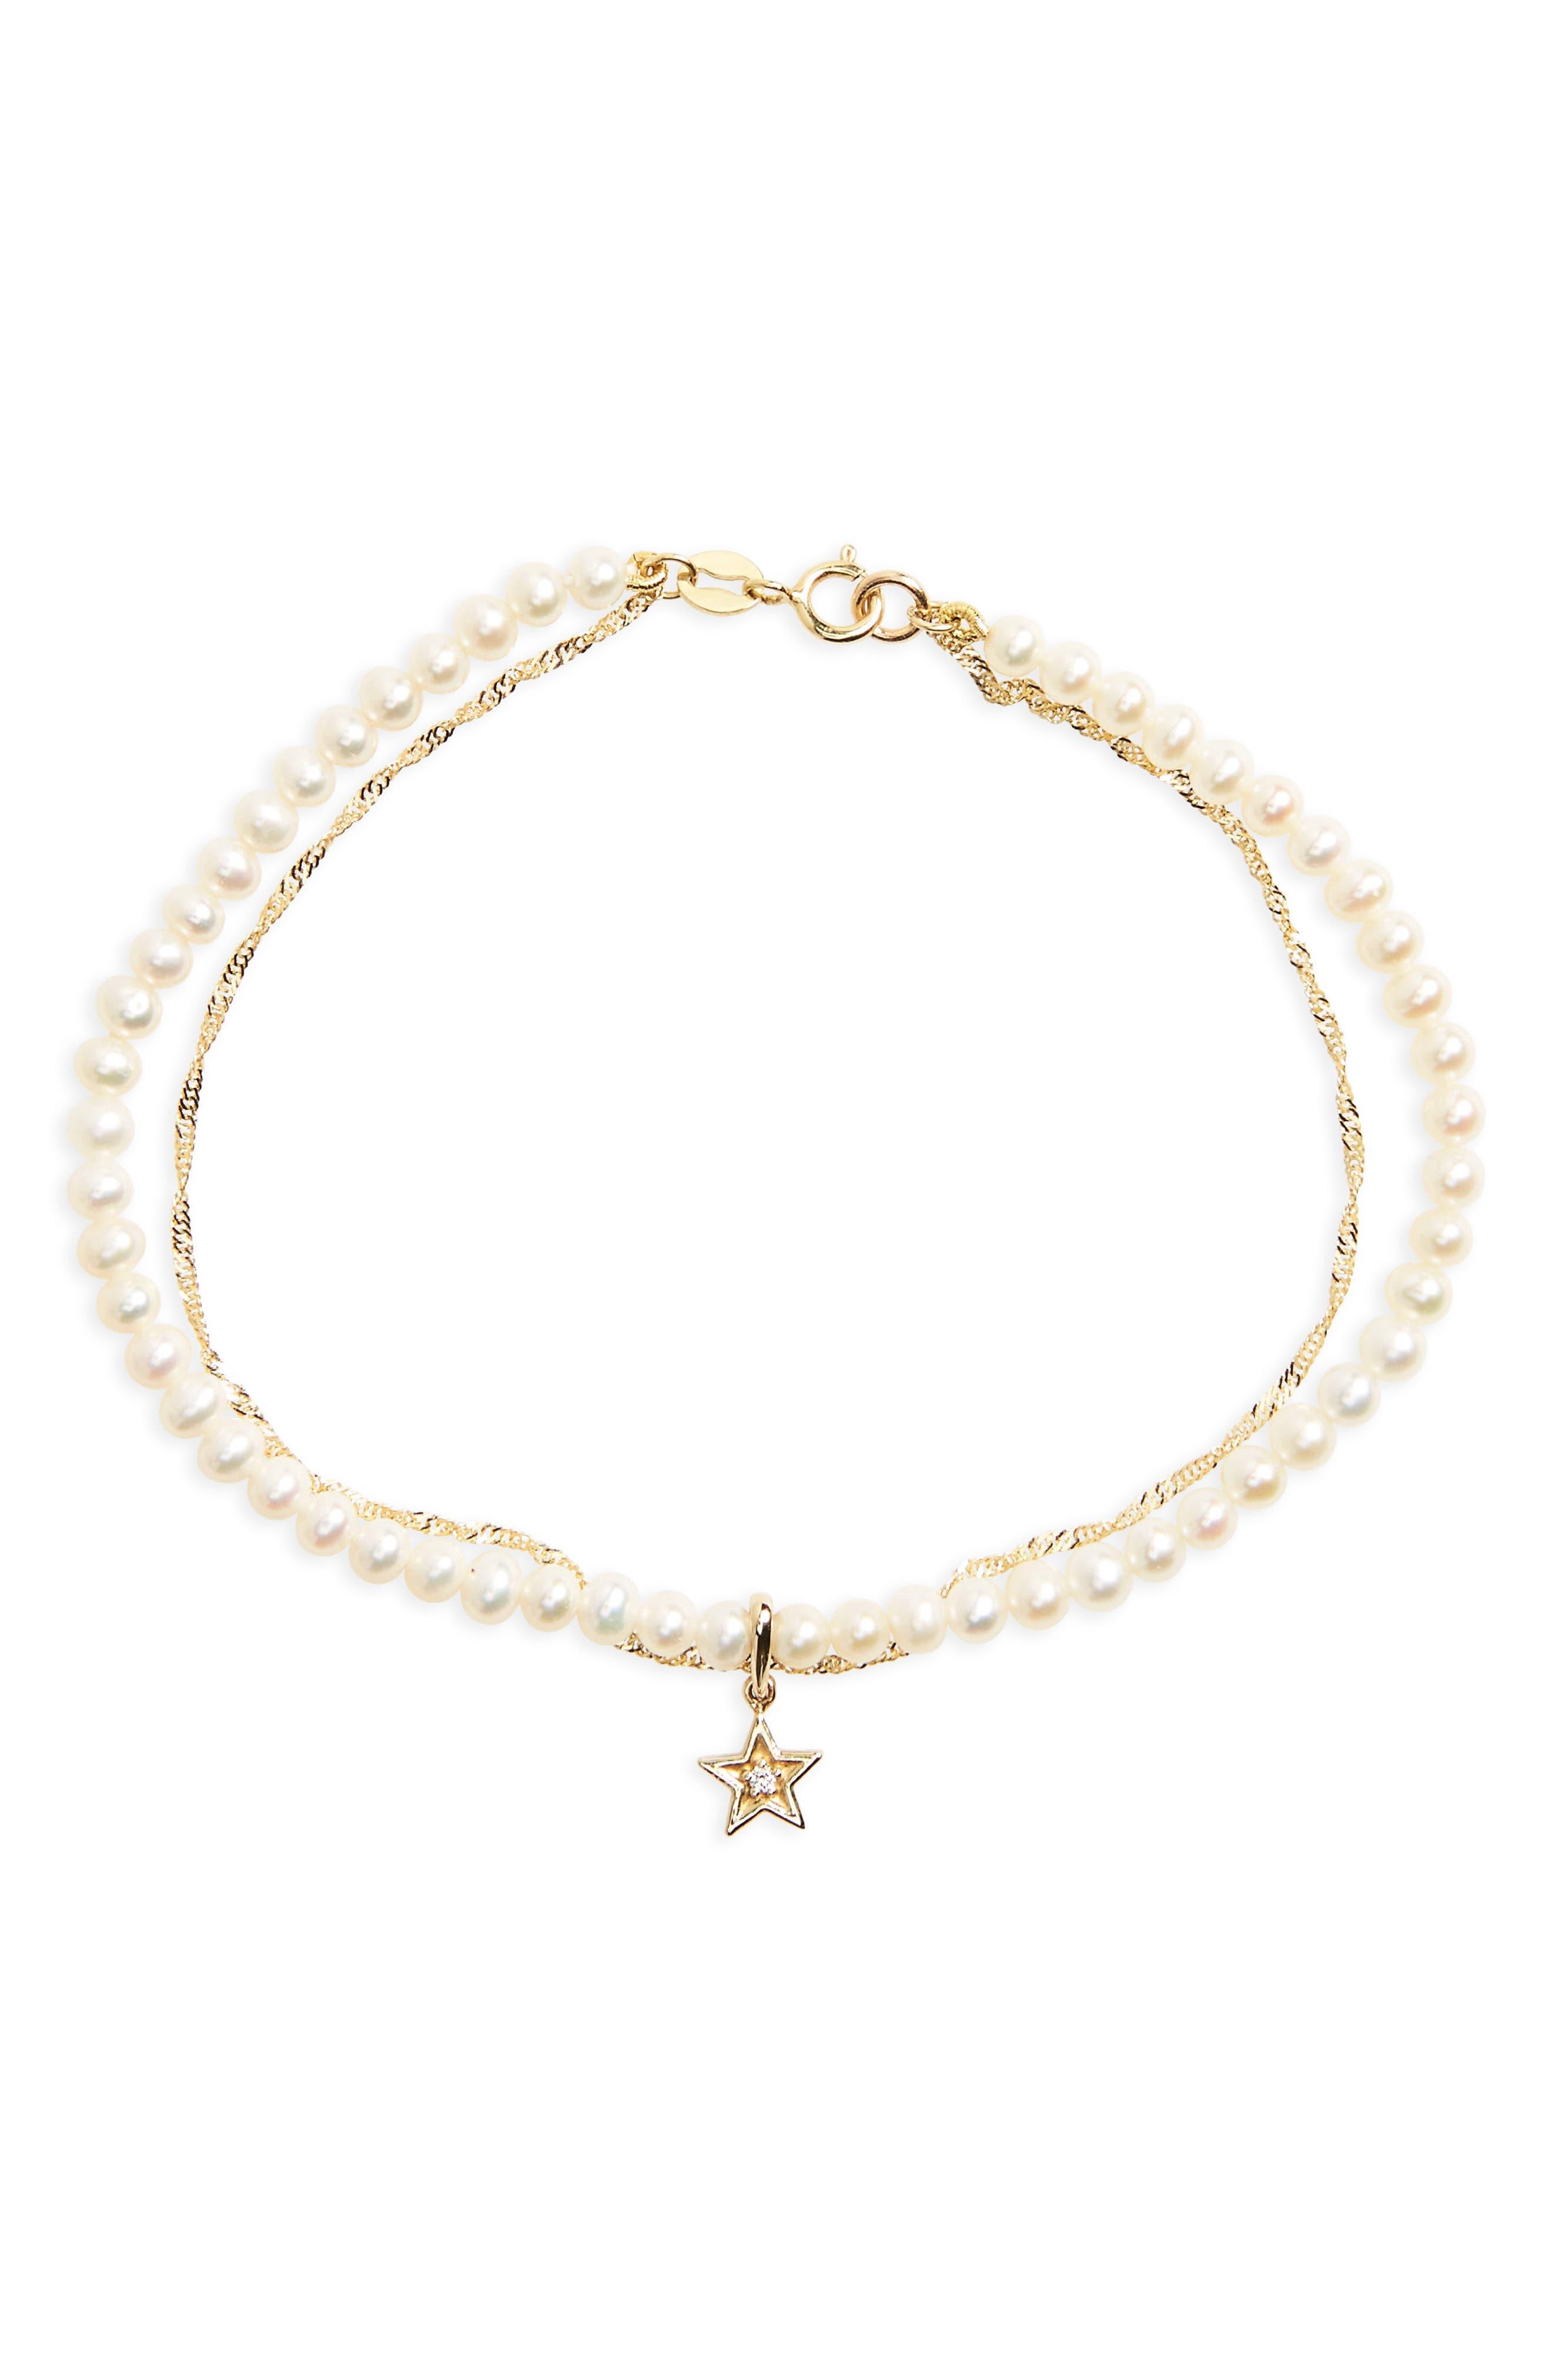 Pavé Diamond & Pearl Chain Bracelet,                             Main thumbnail 1, color,                             YELLOW GOLD